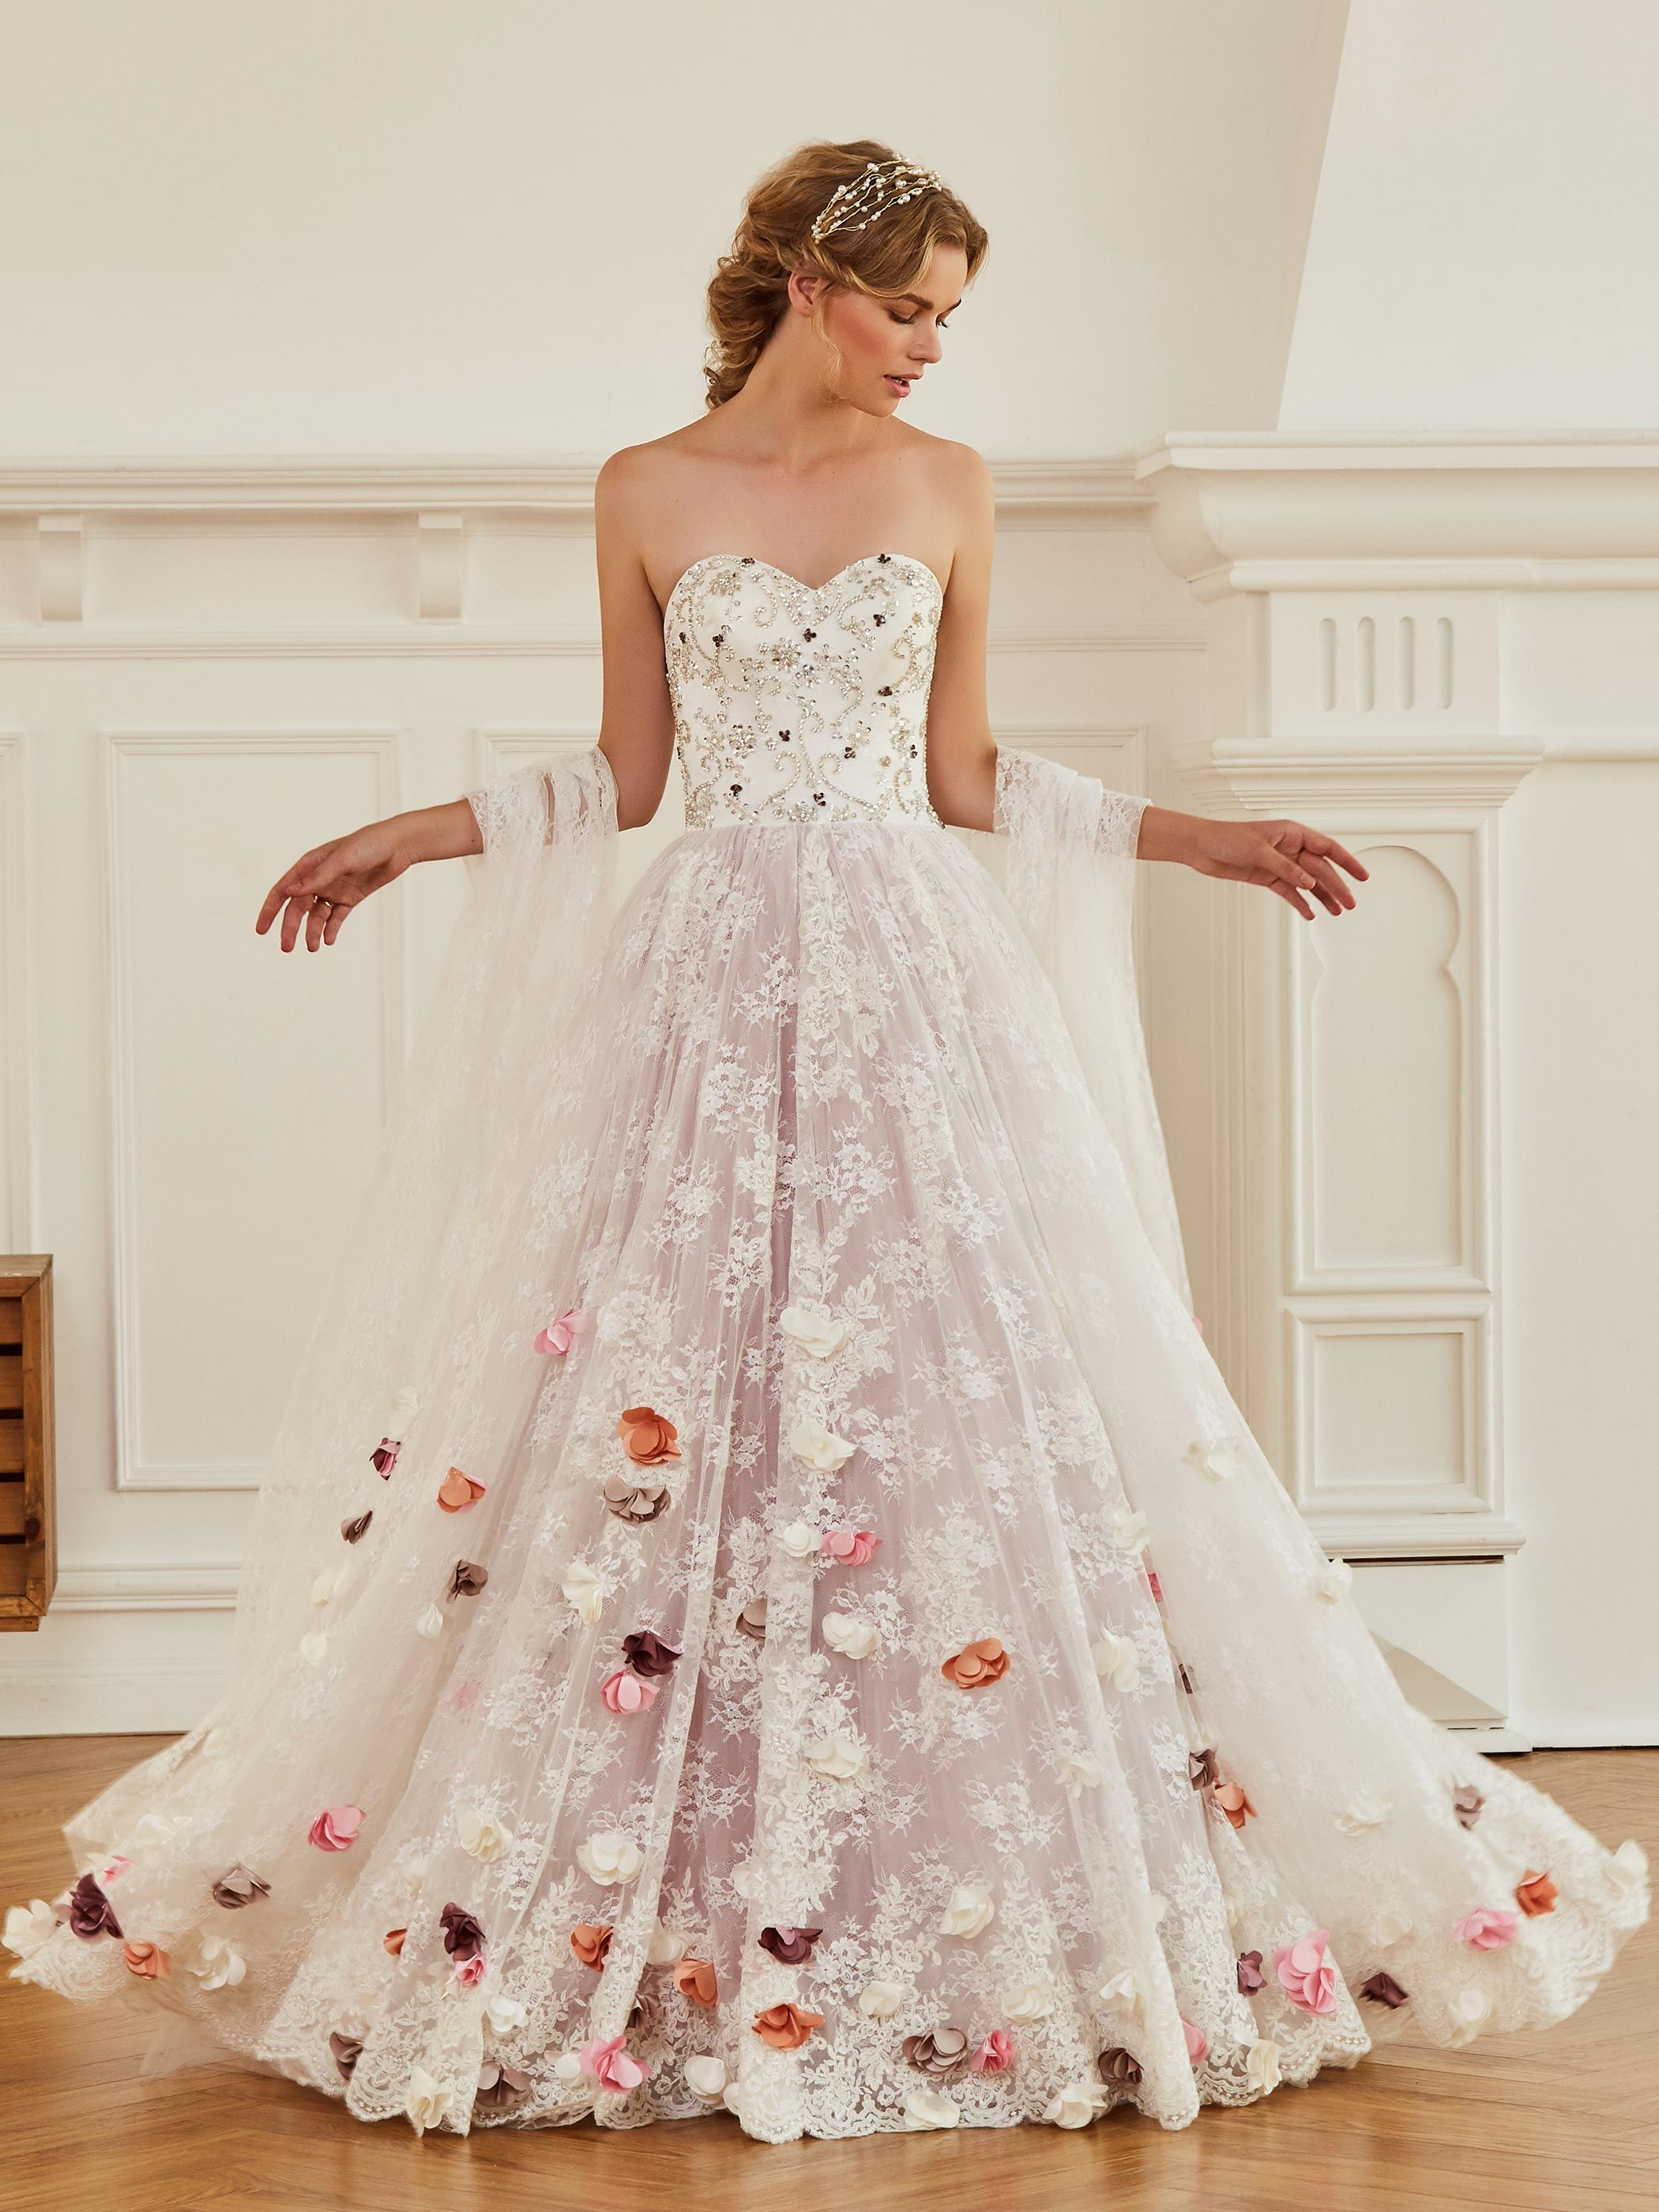 wedding dress with colored flowers off 18   medpharmres.com